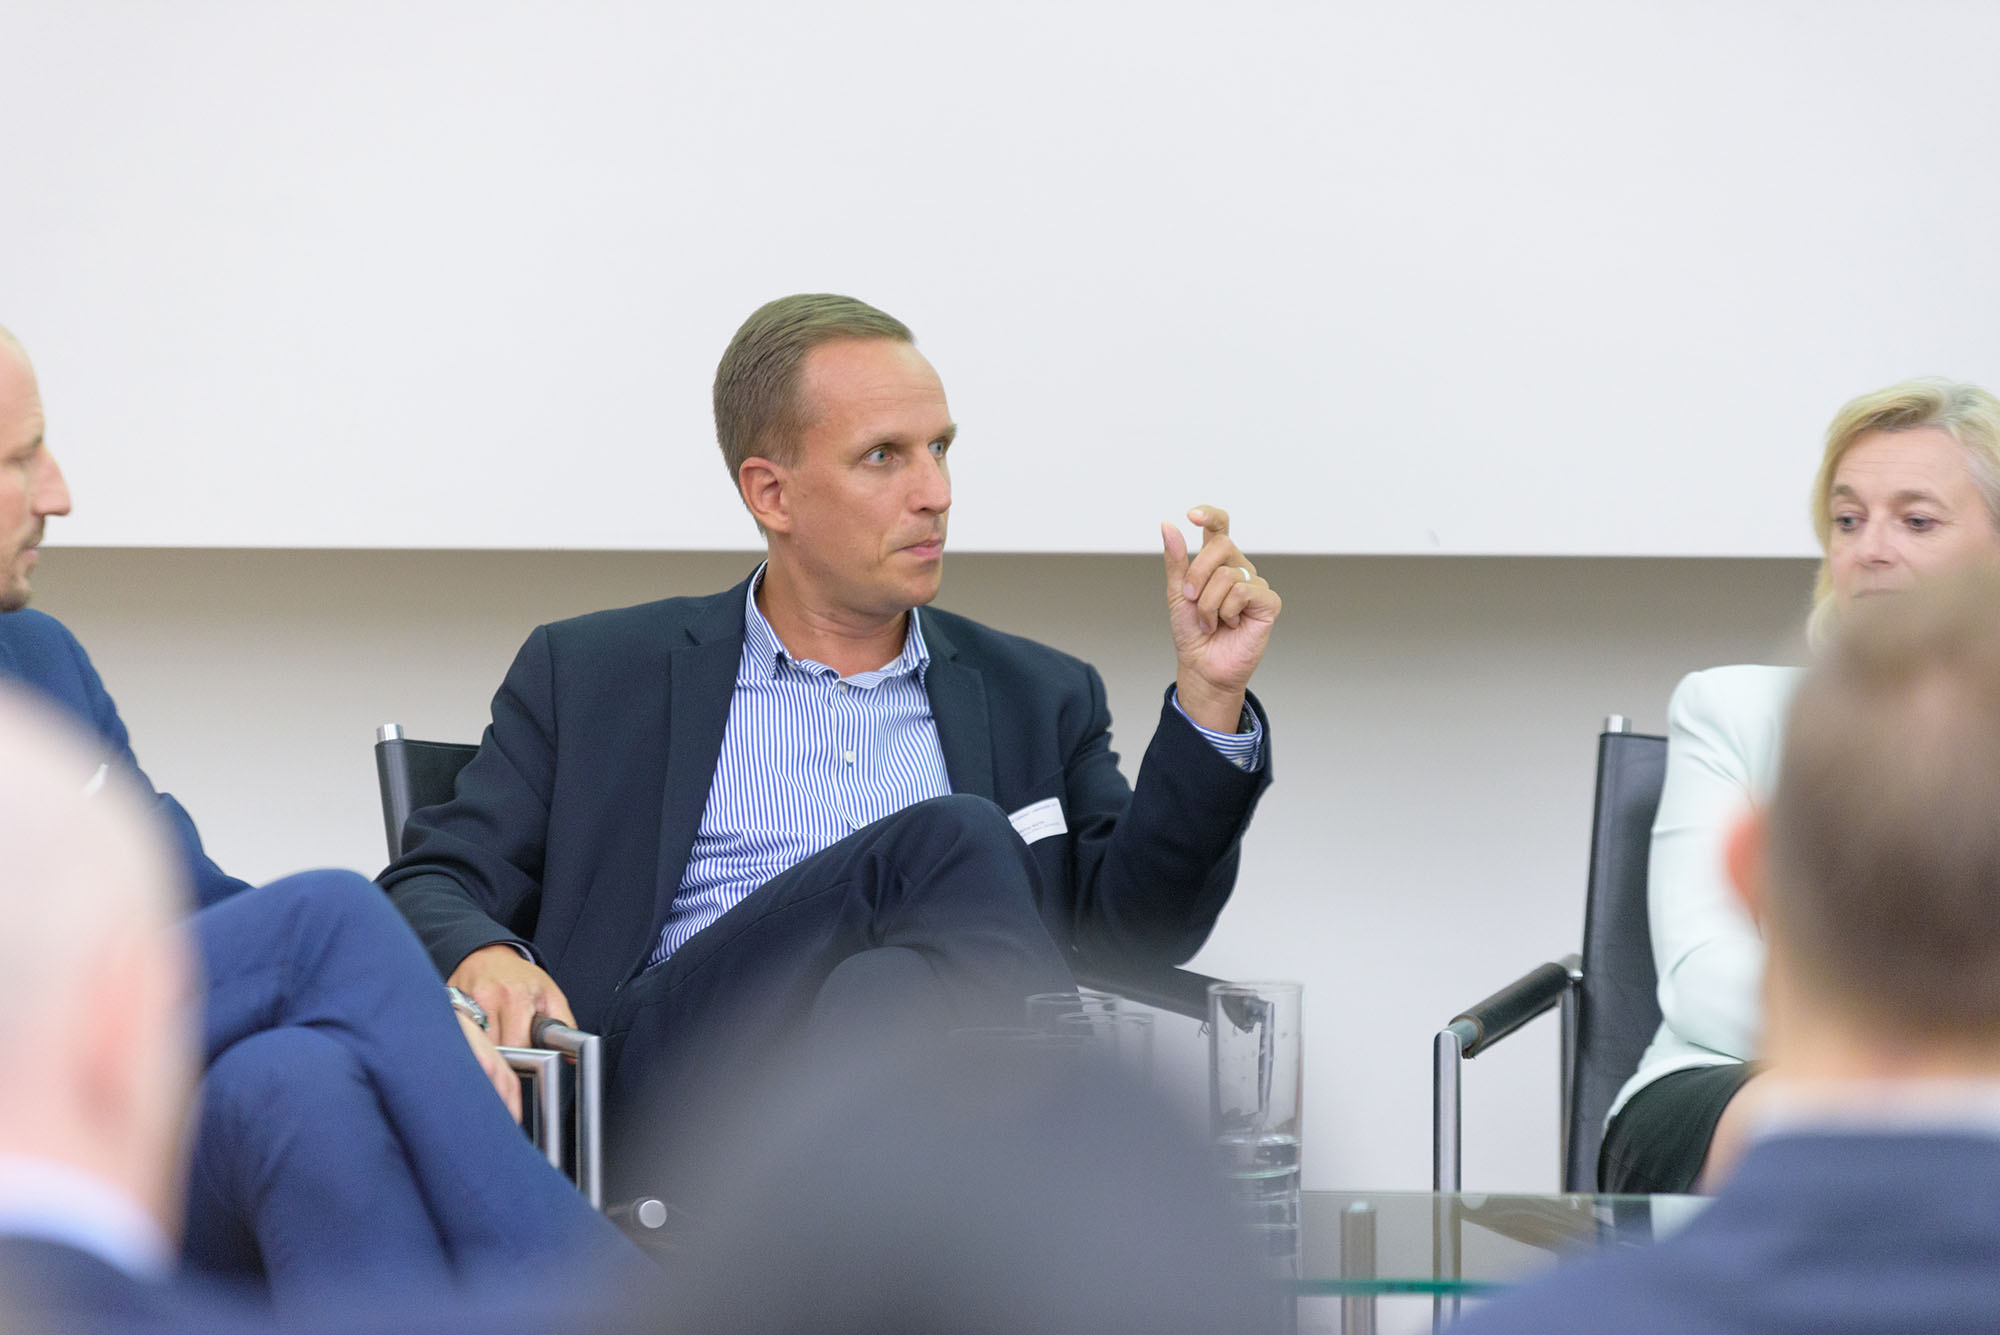 Martin Kathriner, Head of Corporate Affairs Samsung